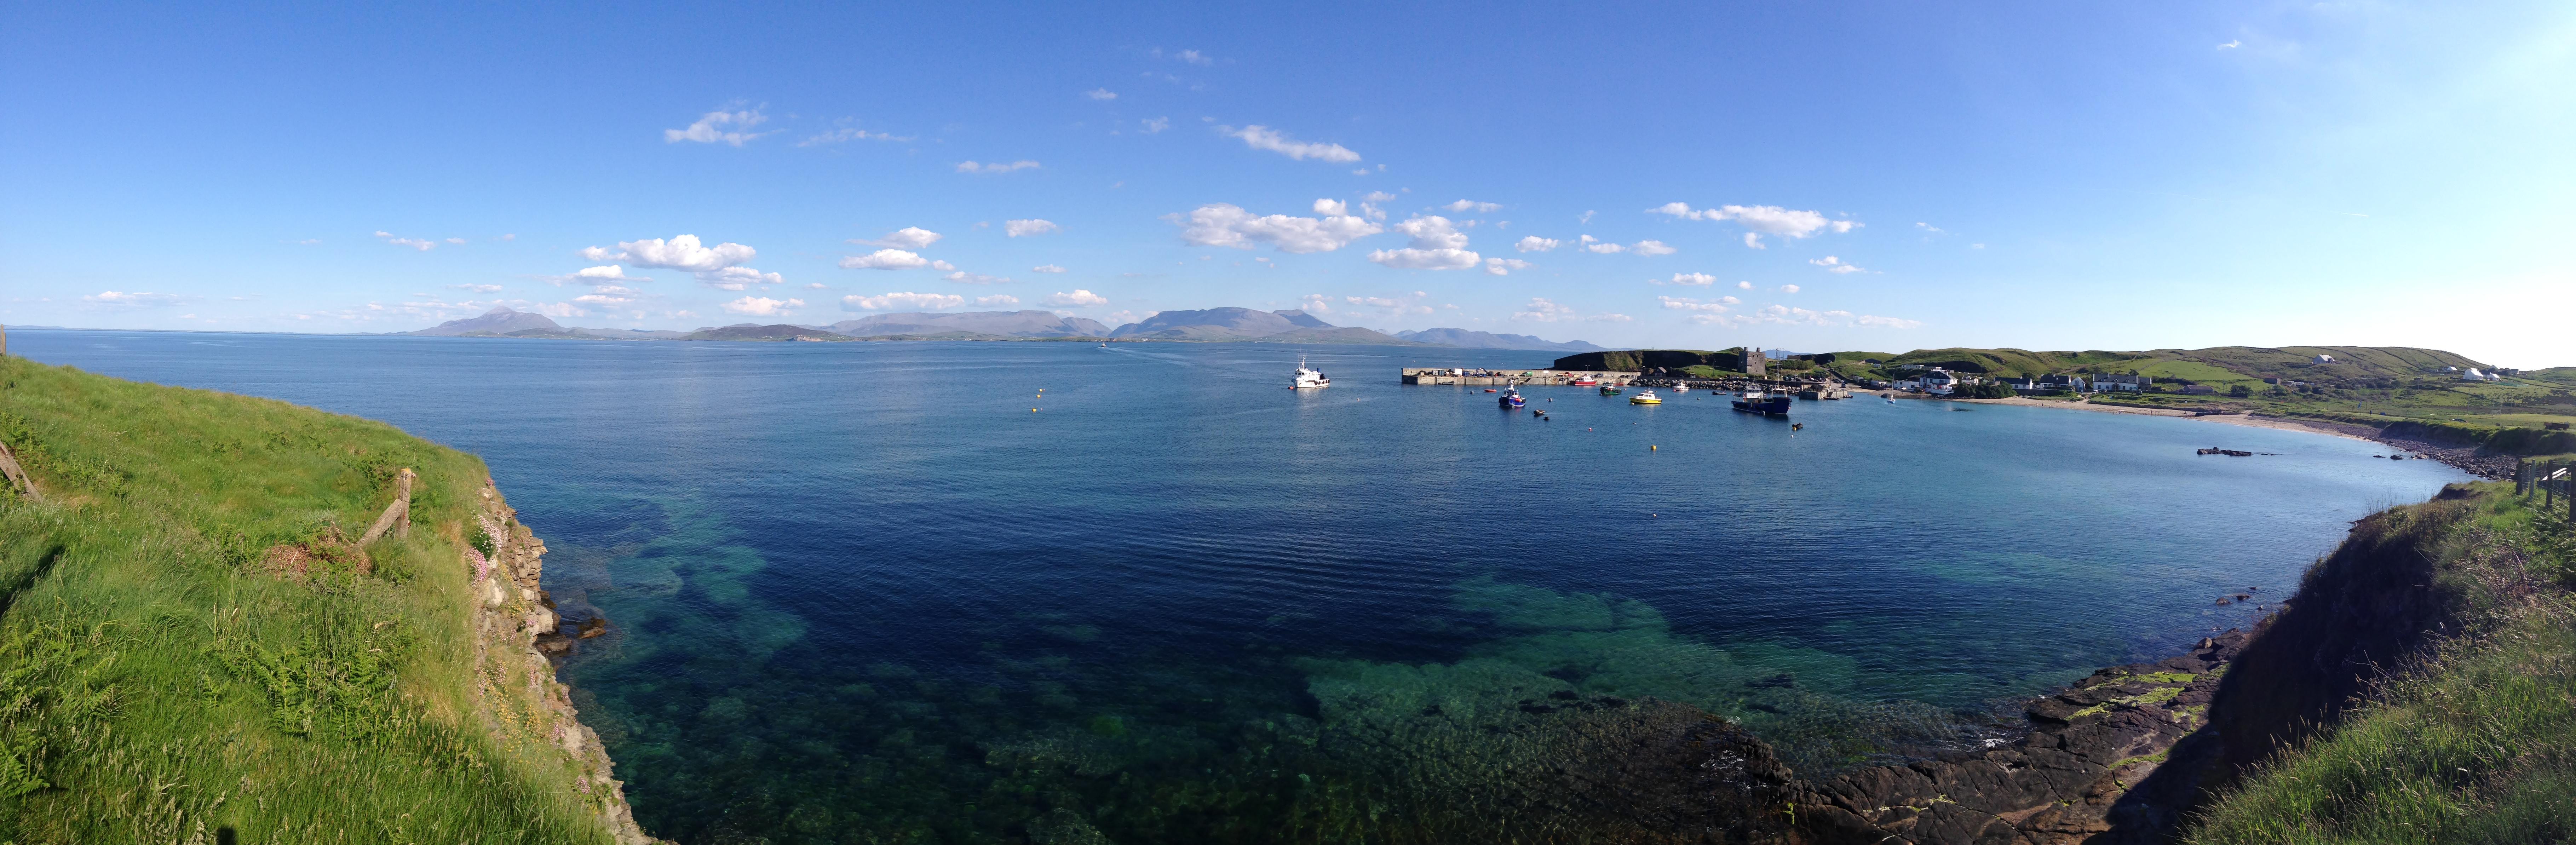 saumon irlande bio Clare Island